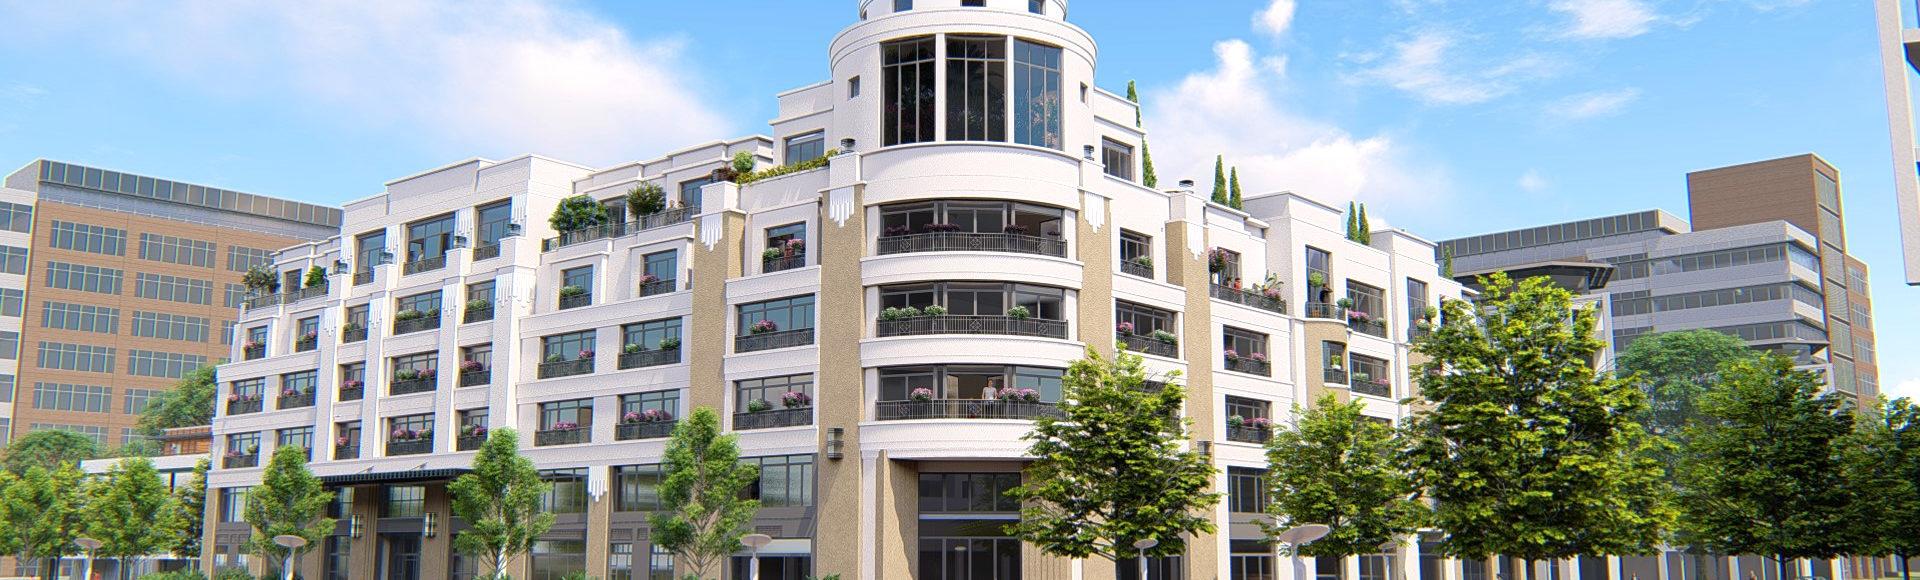 illustration 3d - résidence seniors Palazzo